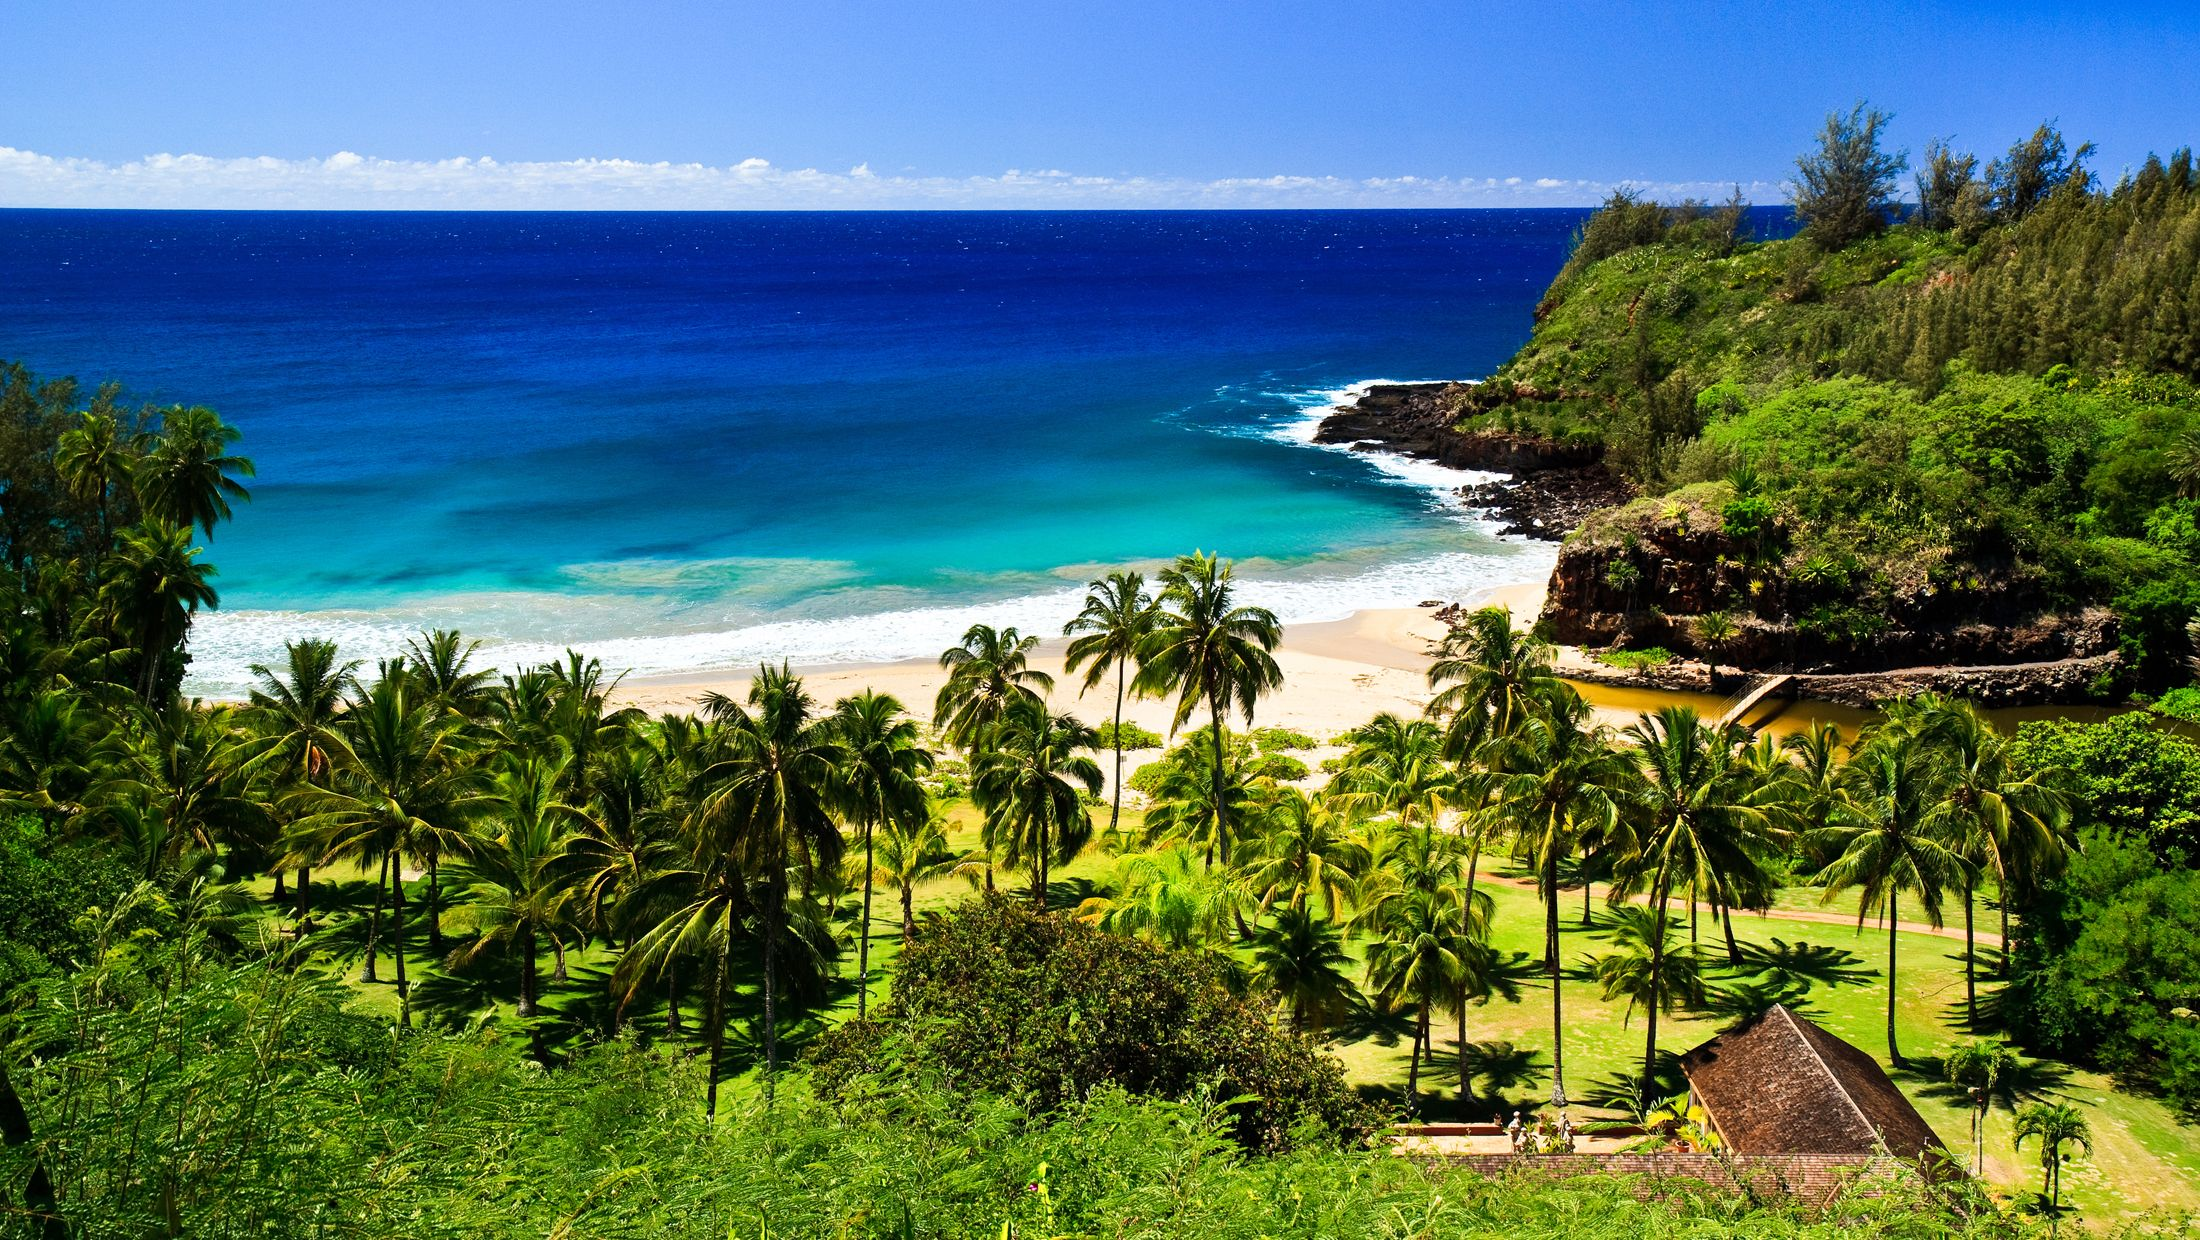 Kauai, Hawaii cruise wanderlust hawaii kauai beach